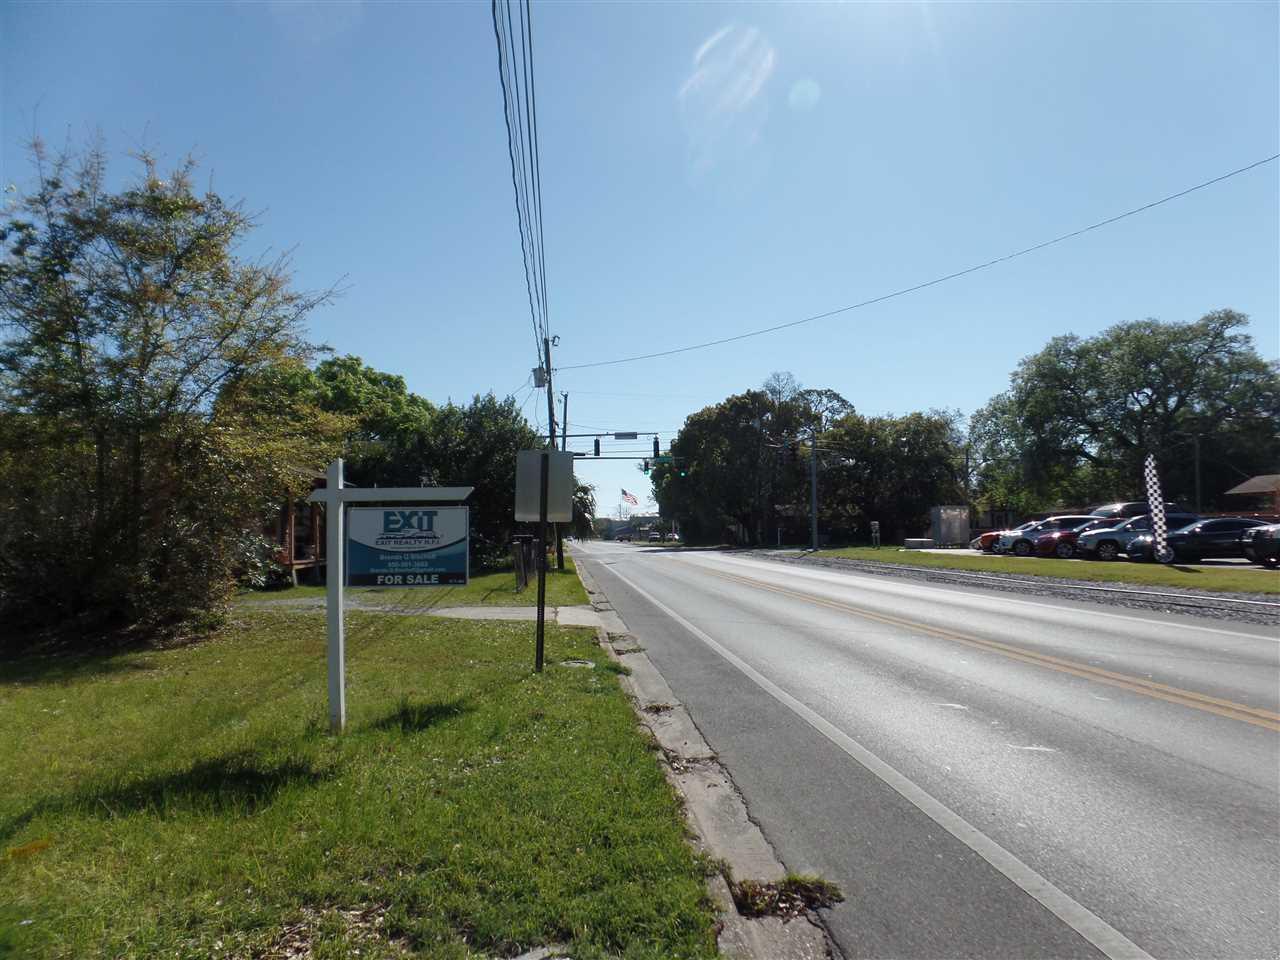 1200 W Main St, Pensacola, FL 32502